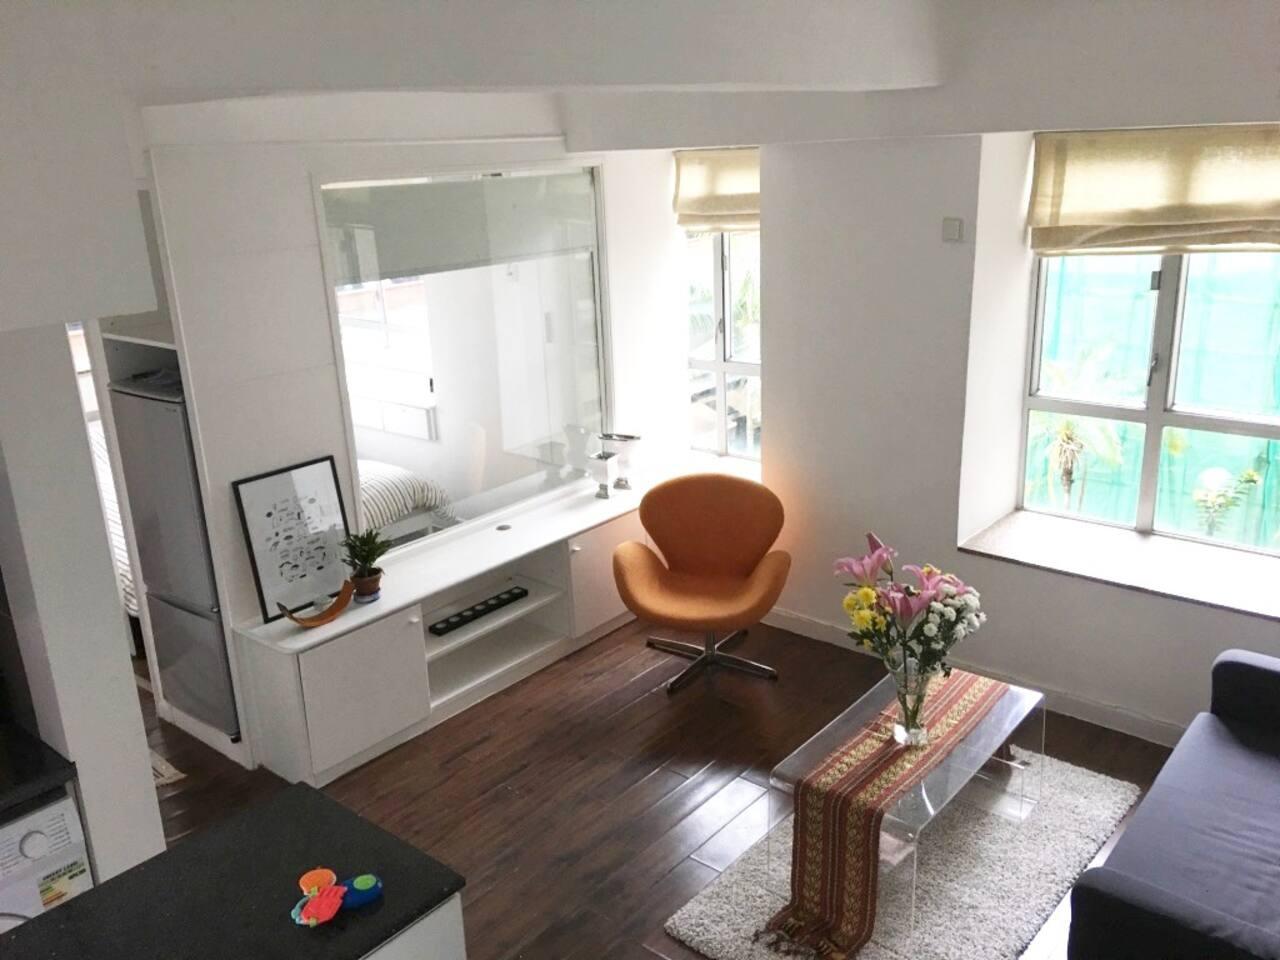 1.5 bedroom in the heart of SoHo